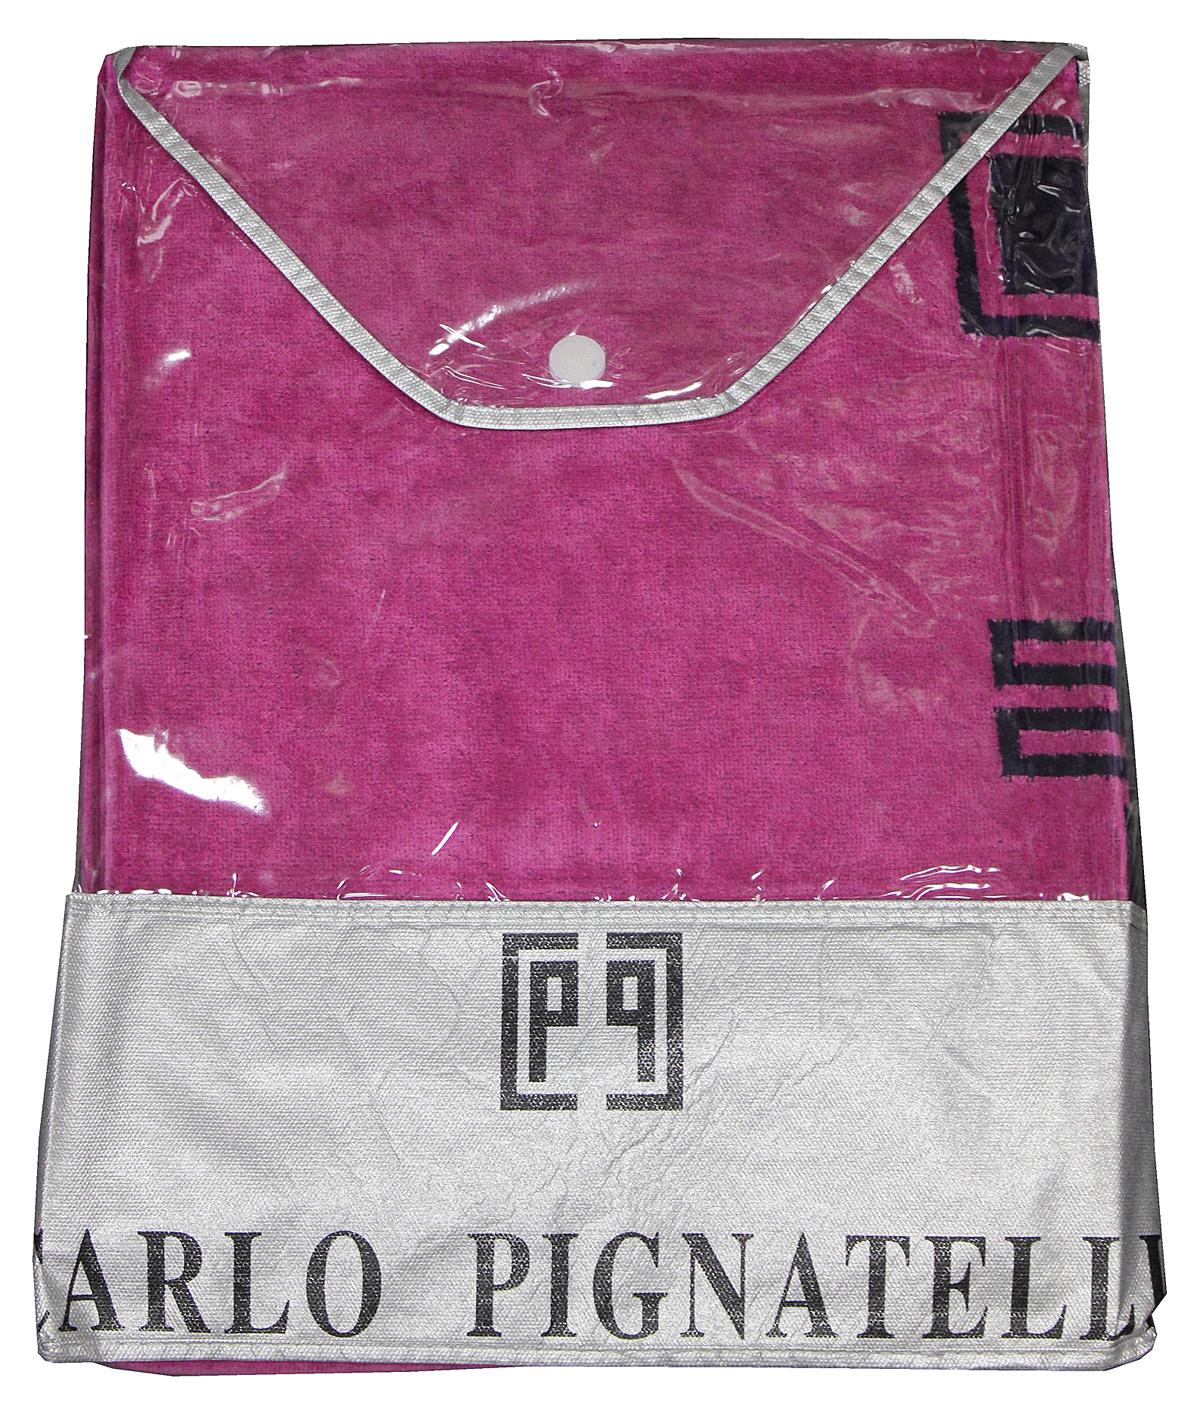 Полотенца Полотенце пляжное 100х180 Carlo Pignatelli Castelli Fuxia polotentse-plyazhnoe-100h180-carlo-pignatelli-castelli-fuxia-italiya.jpg